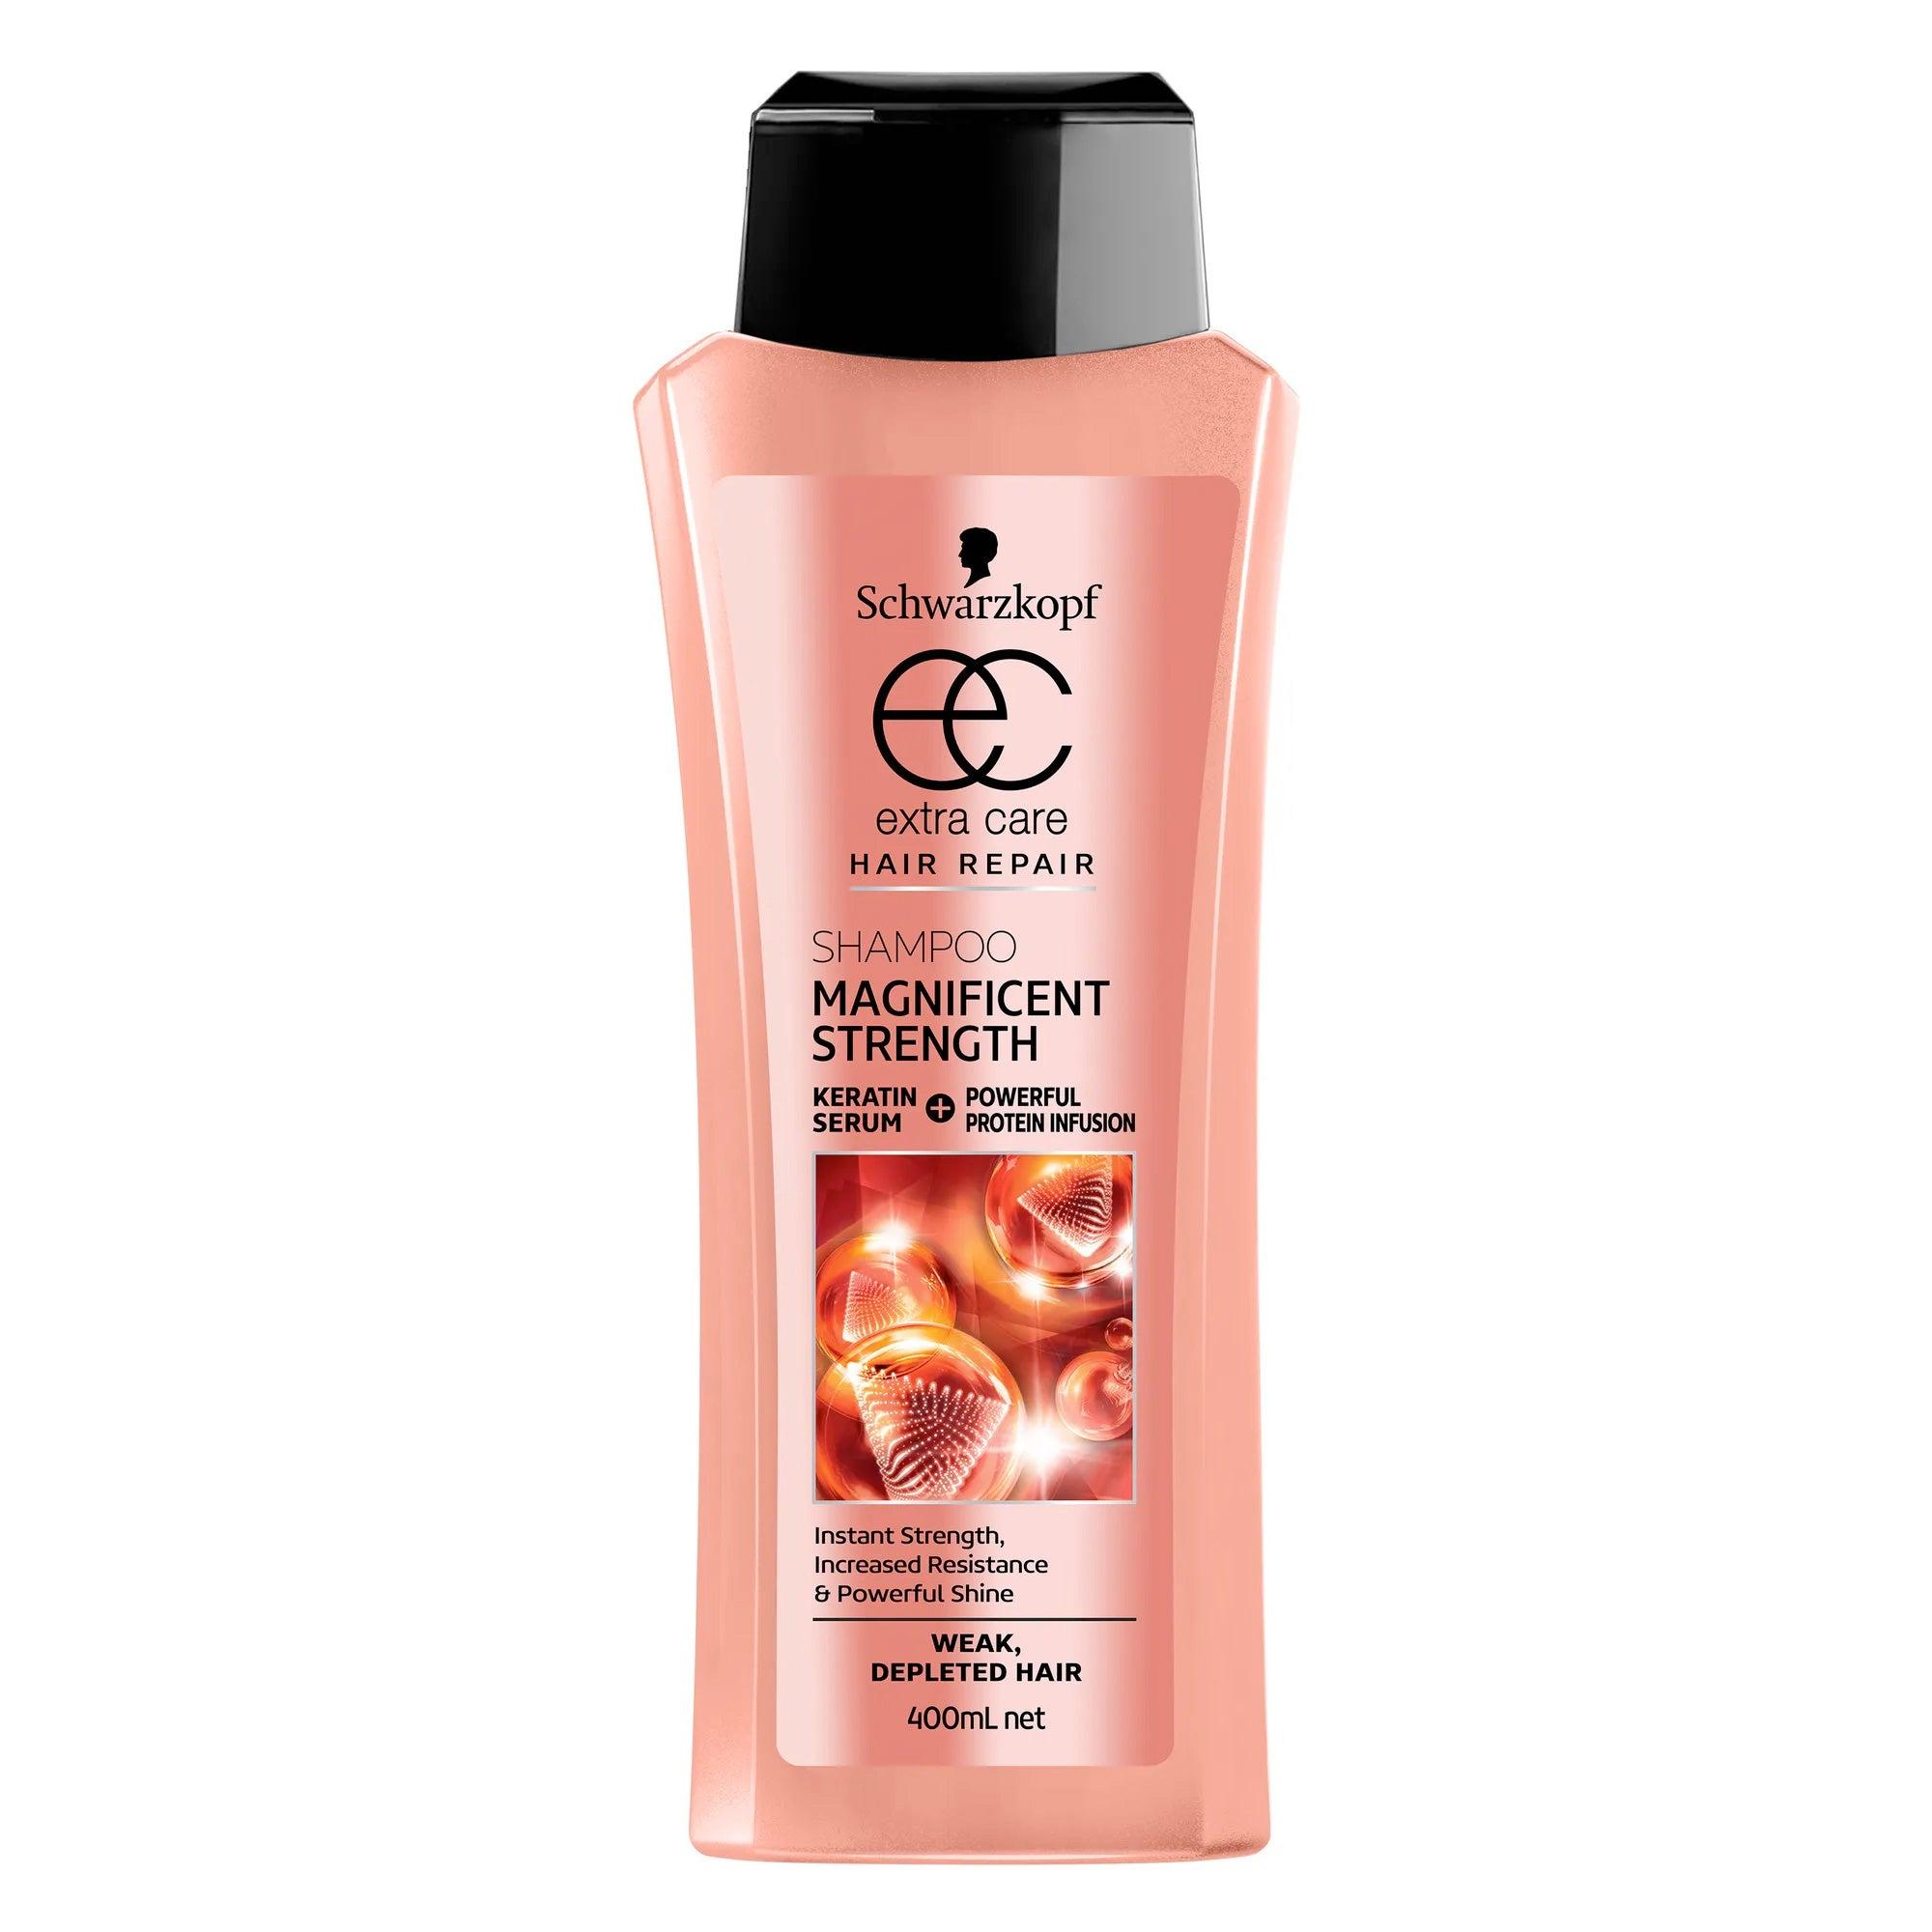 Schwarzkopf Extra Care Magnificent Strength Shampoo 400ml